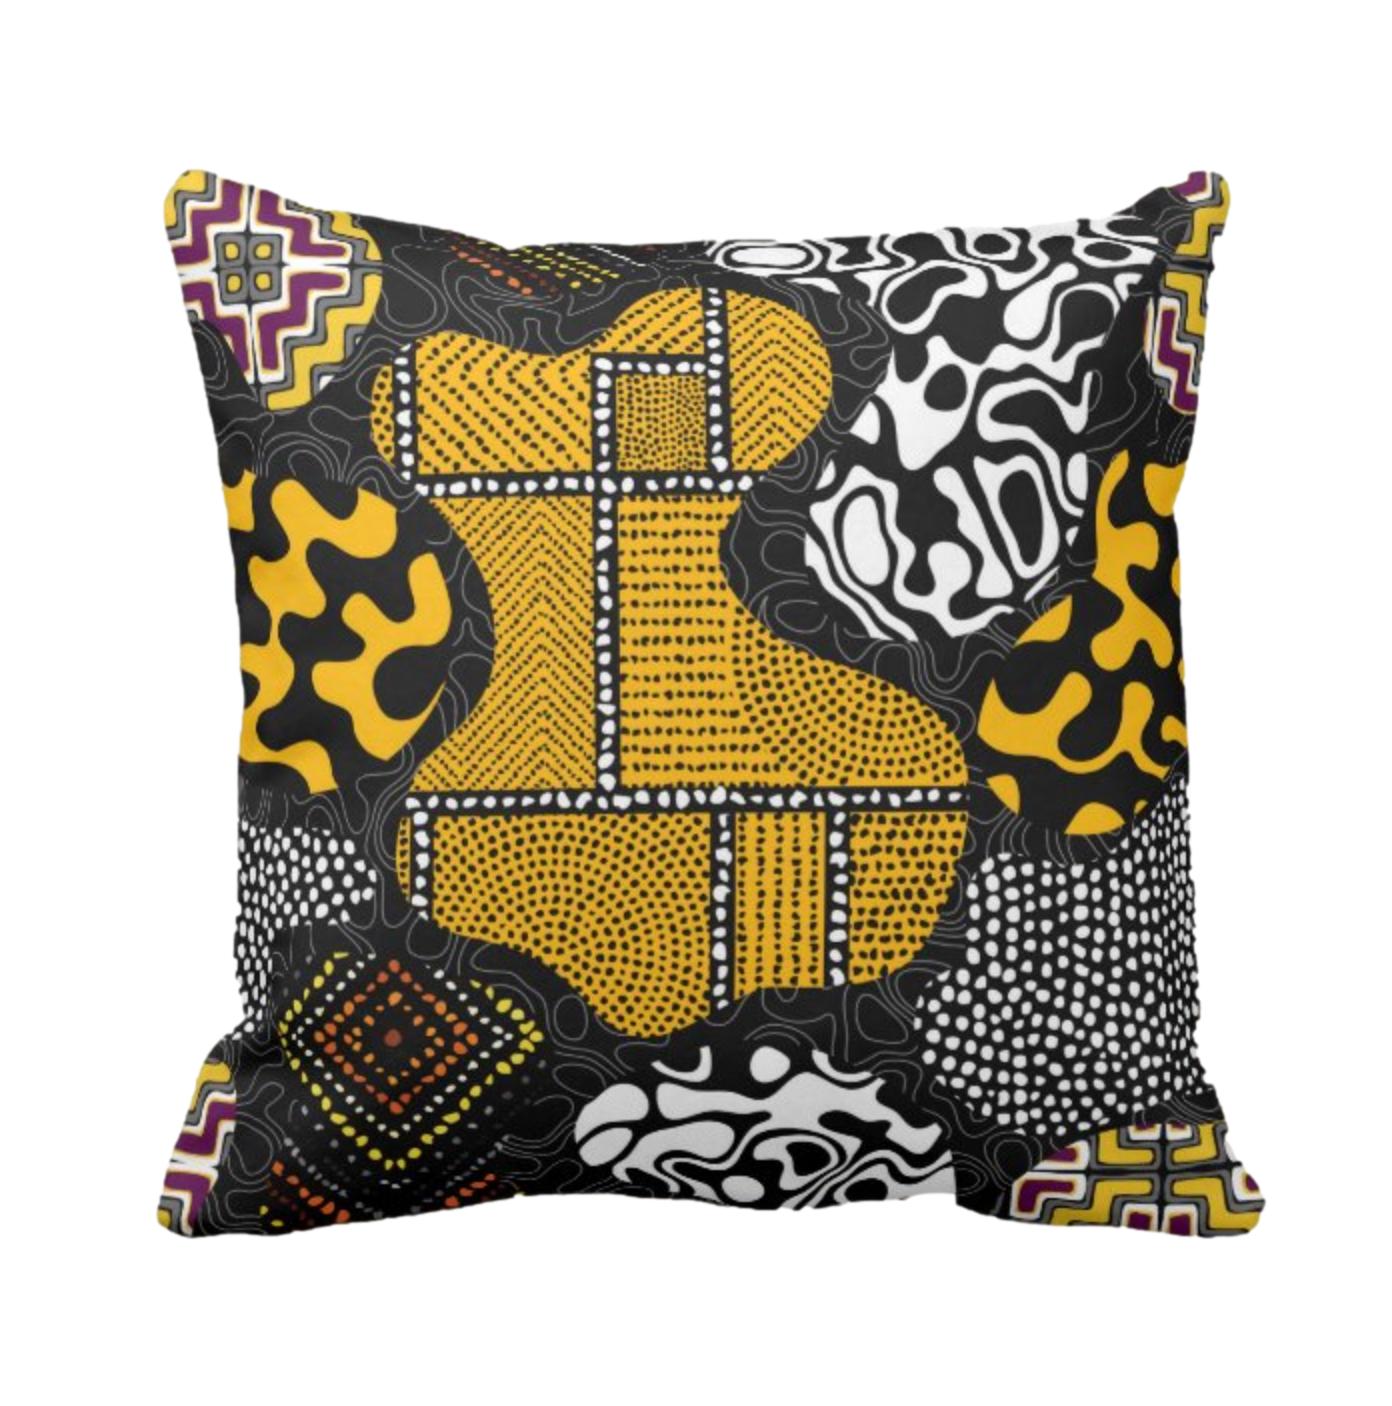 Afro Patchwork Print Design 7 Throw Cushion